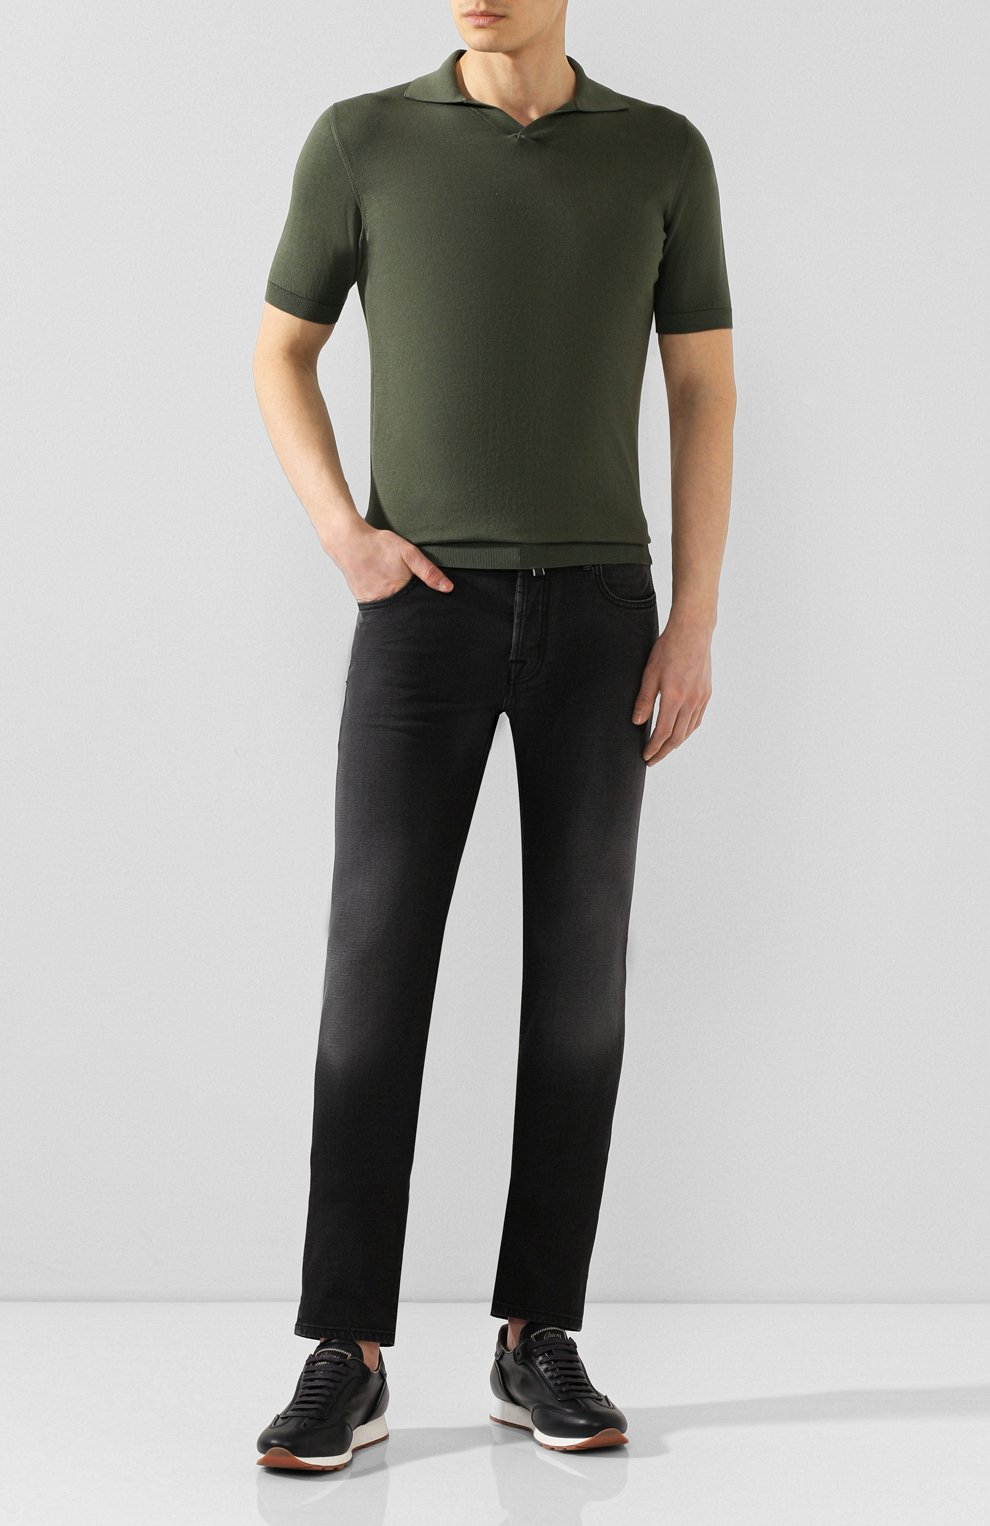 Мужские джинсы JACOB COHEN черного цвета, арт. J688 C0MF 01841-W1/53   Фото 2